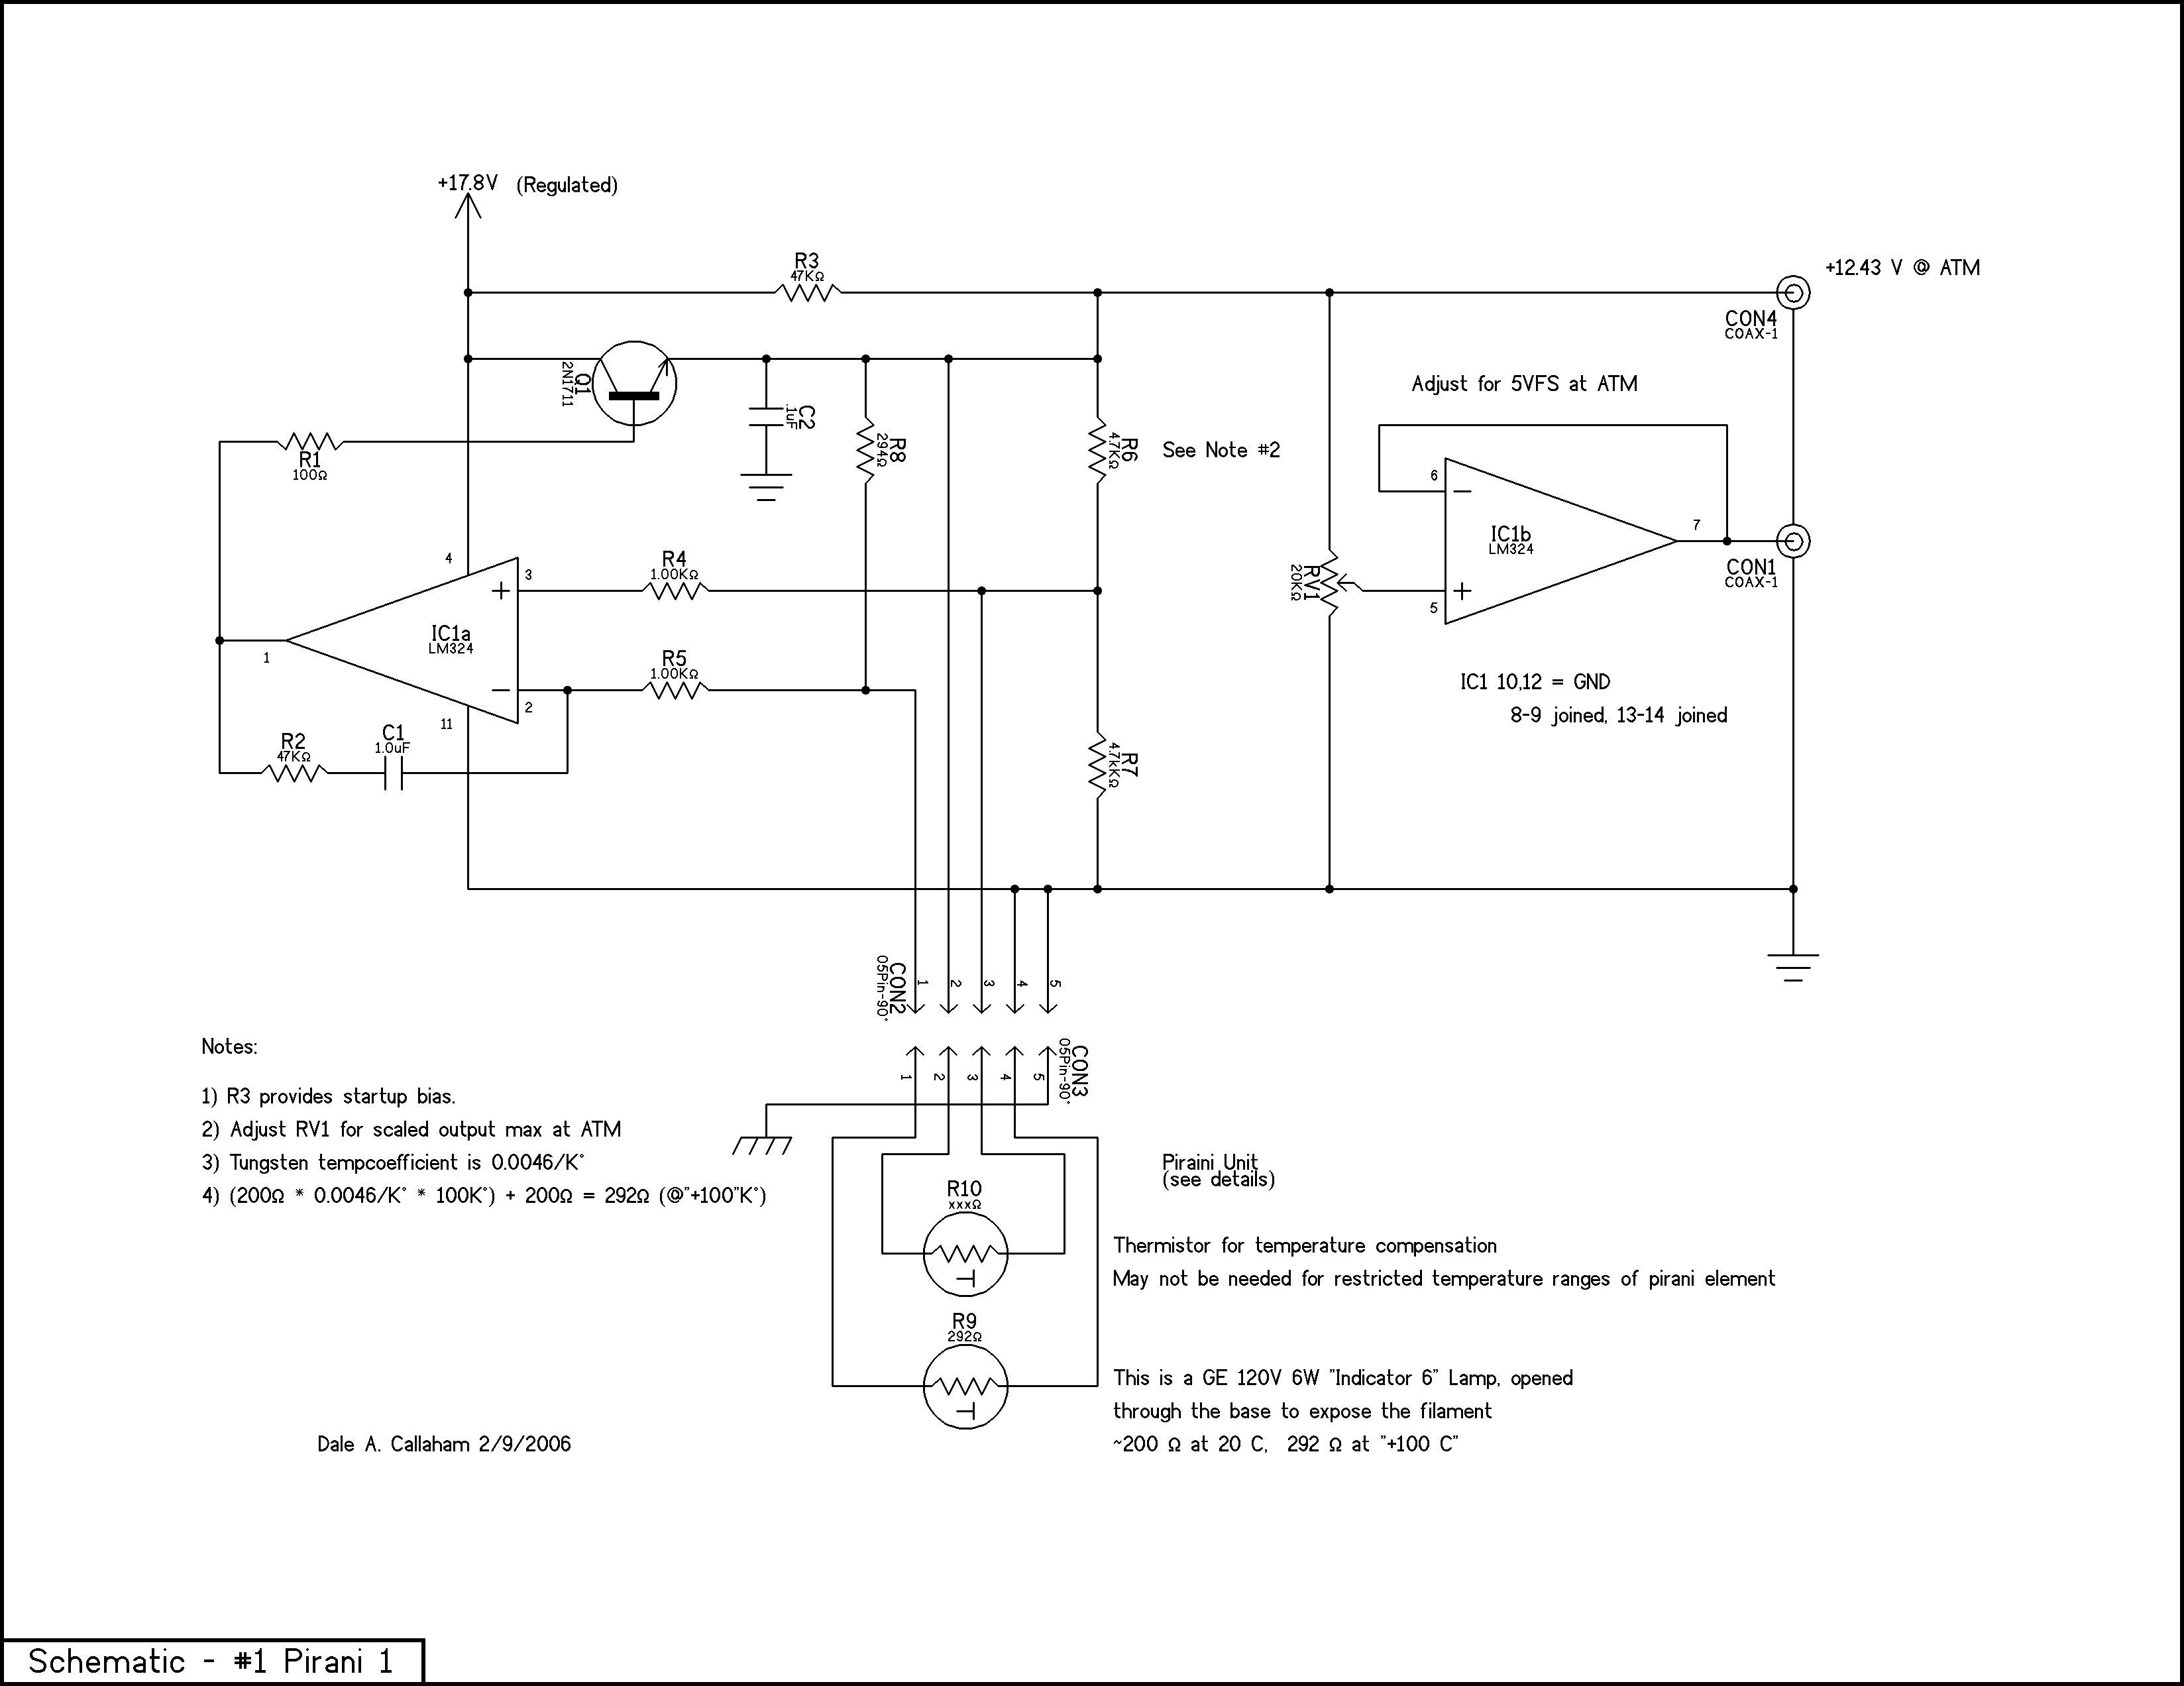 ke light wiring diagram ke circuit diagrams wire center u2022 rh pepsicolive co Light and Outlet Wiring Diagrams Light Wiring Diagrams Multiple Lights